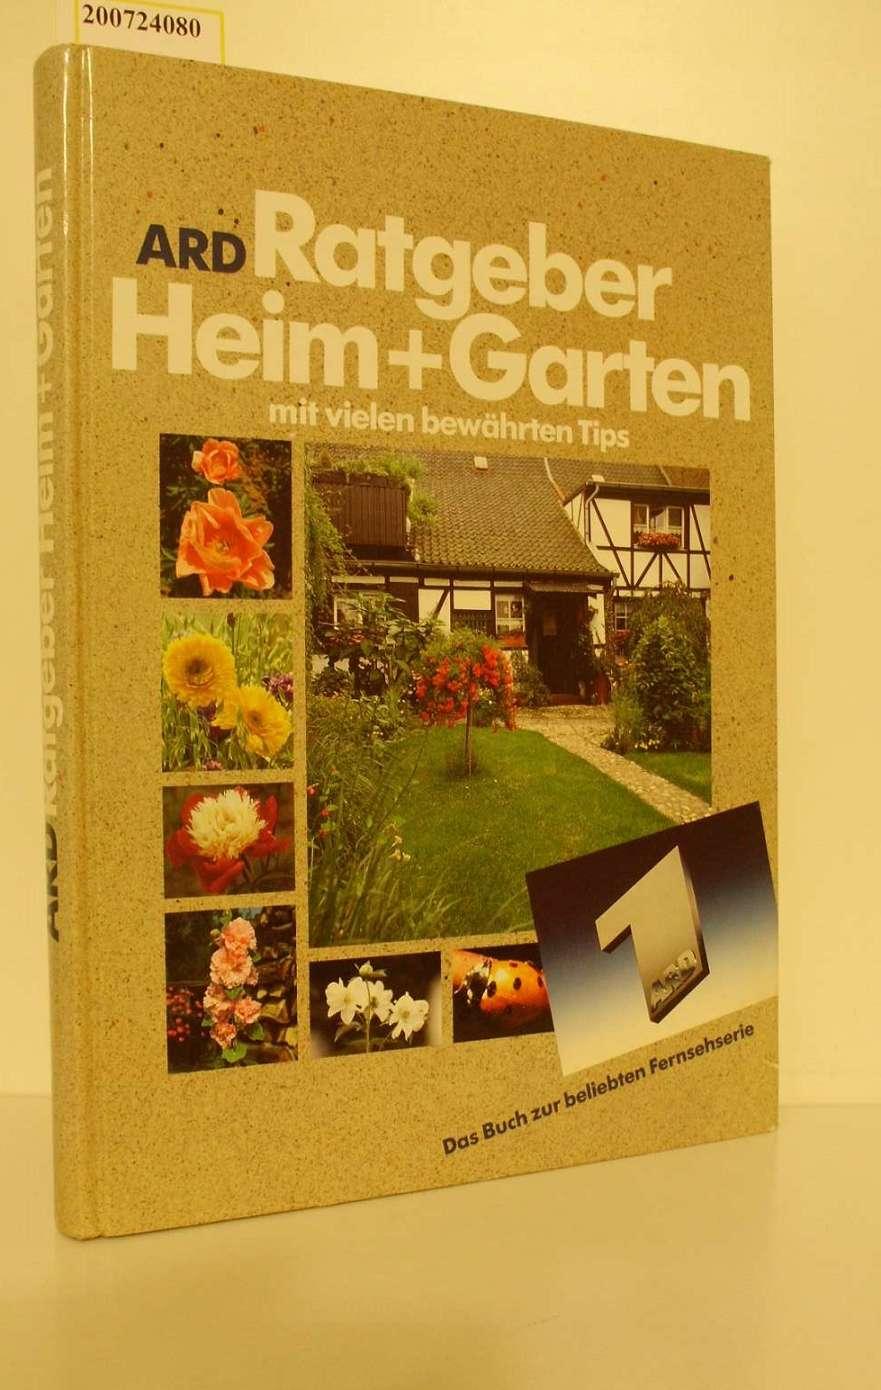 Ratgeber Heim + Garten : das Buch zur beliebten Fernsehserie ; ARD / Hrsg.: H. Diether Ebeler im Auftr. d. WDR. Text: Gabriele Vocke. [Fotos: Hansjosef Peters-Jochum]